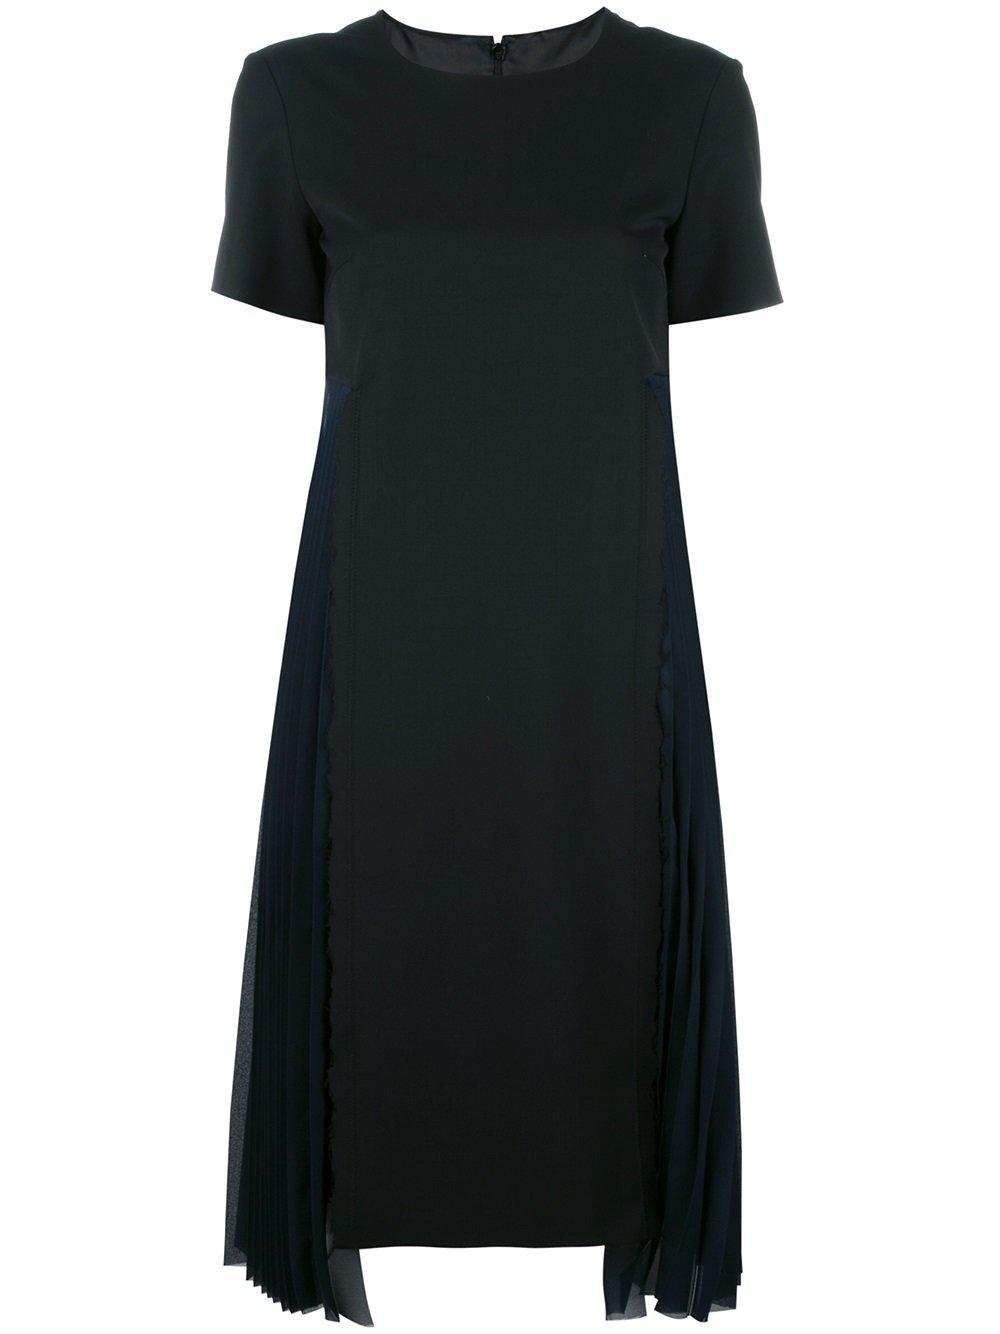 Maison margiela pleated trim t shirt dress in black lyst for Black pleated dress shirt